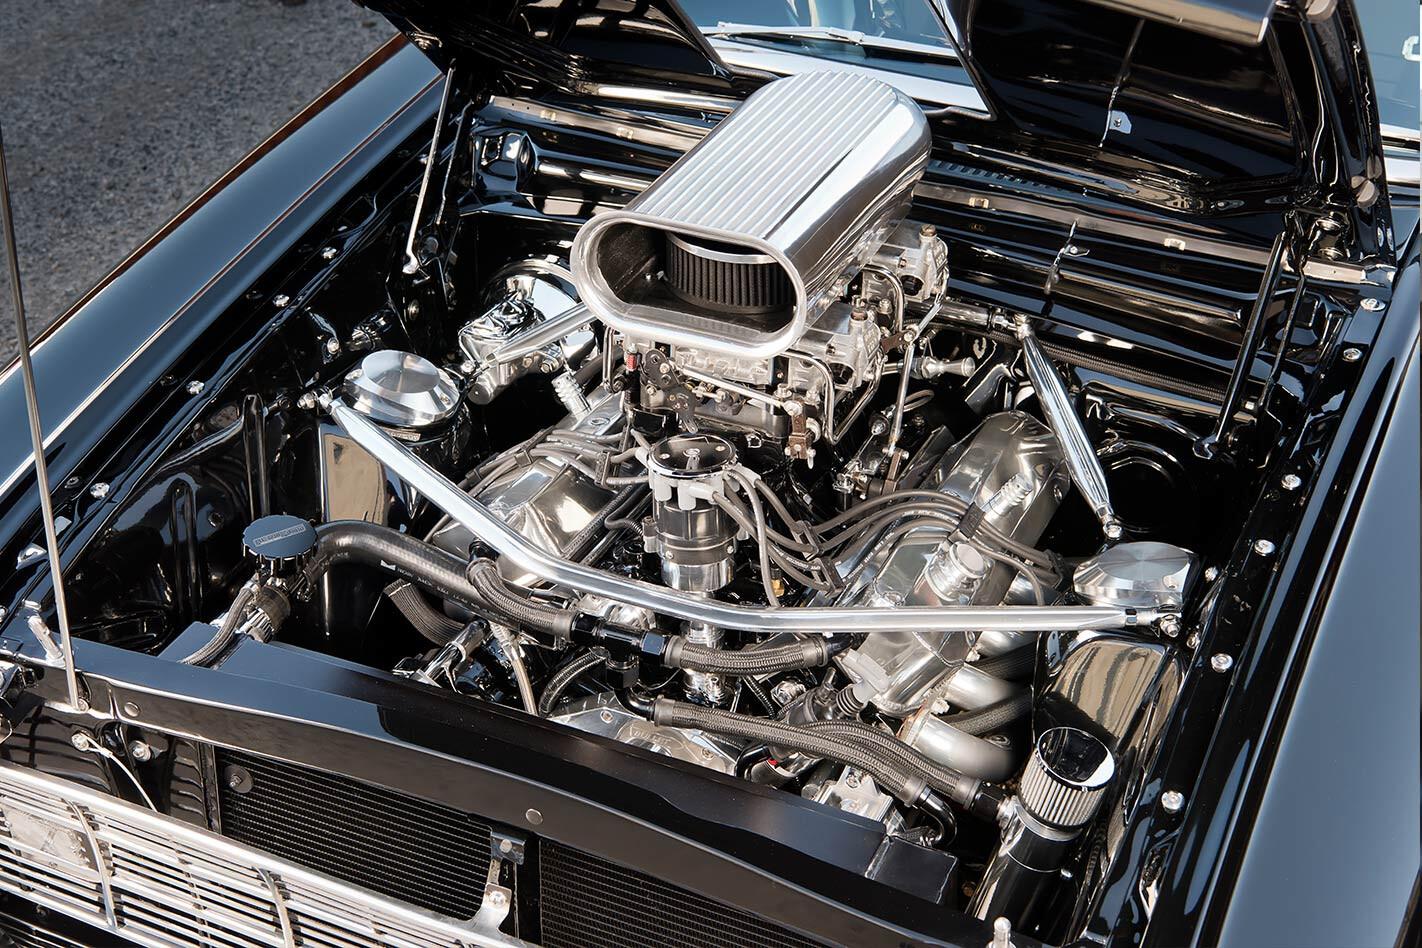 Ford Falcon XK ute engine bay